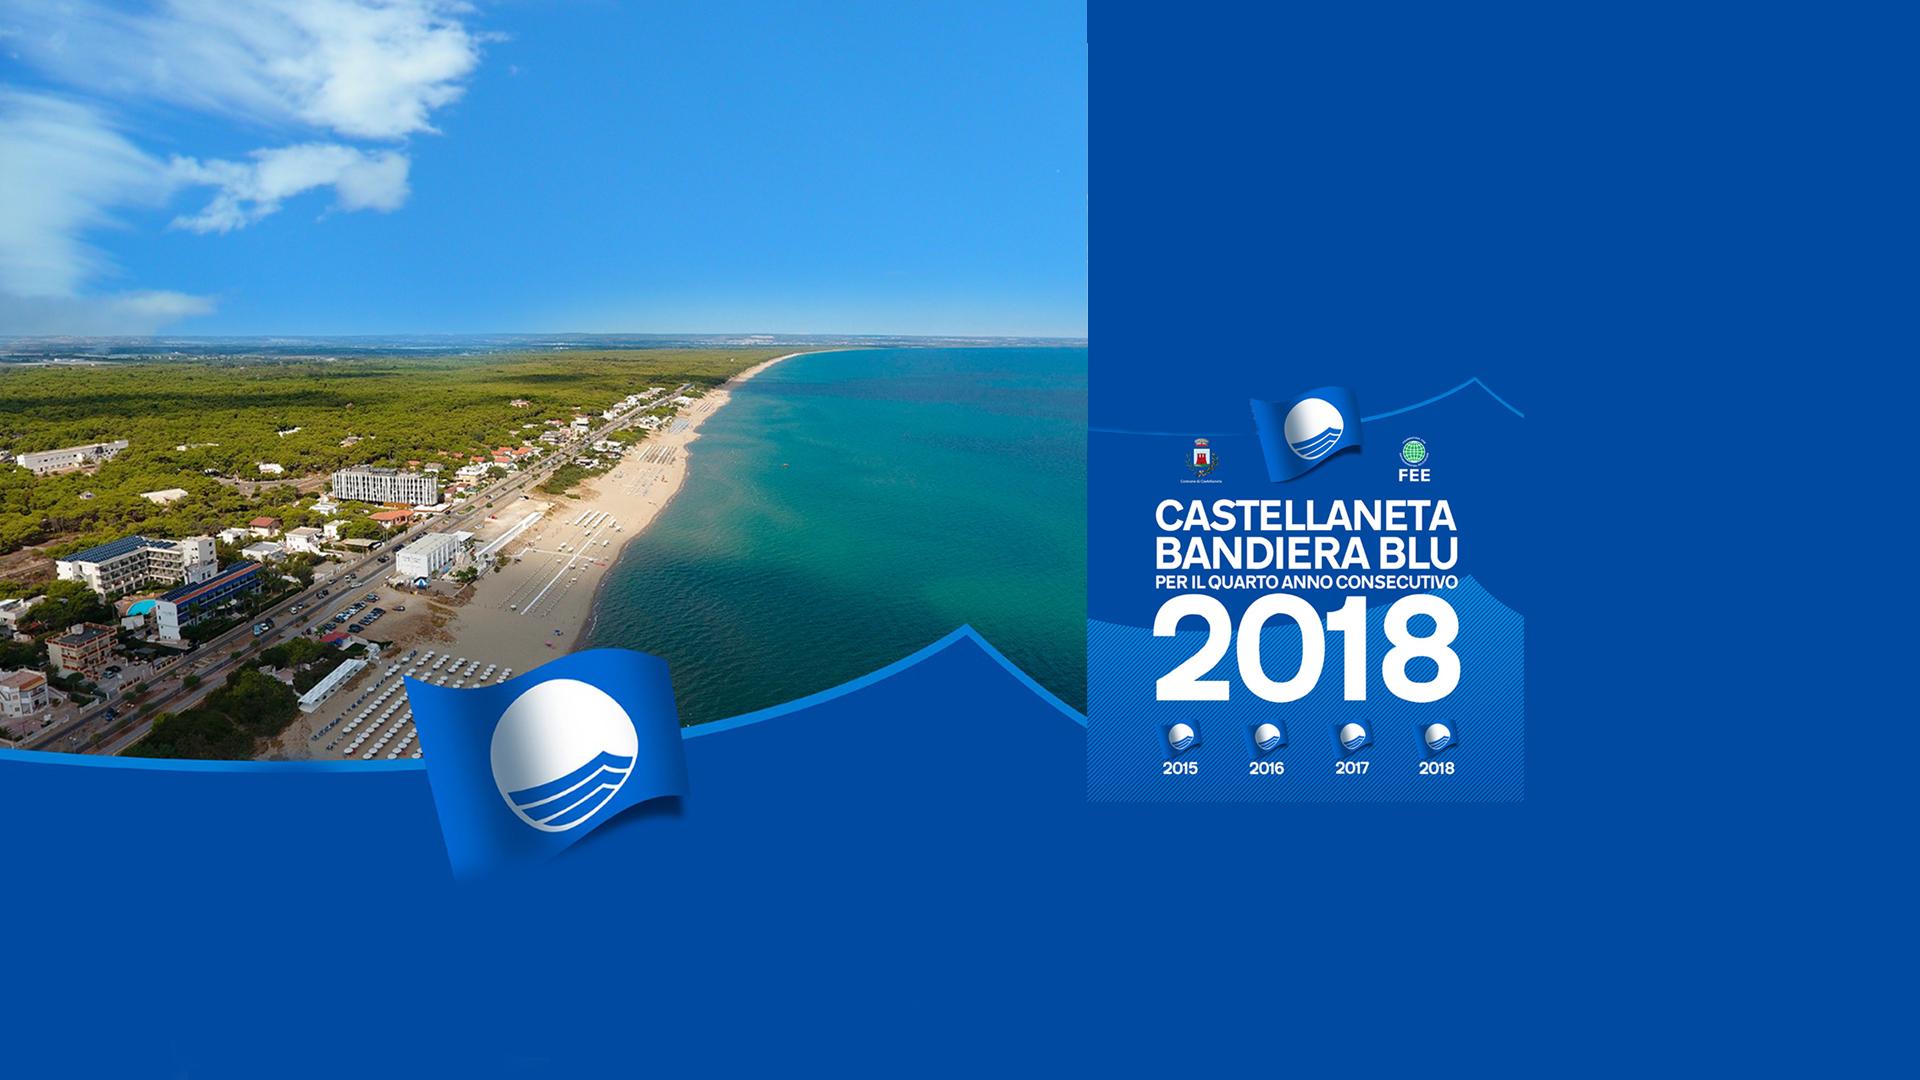 castellaneta-2